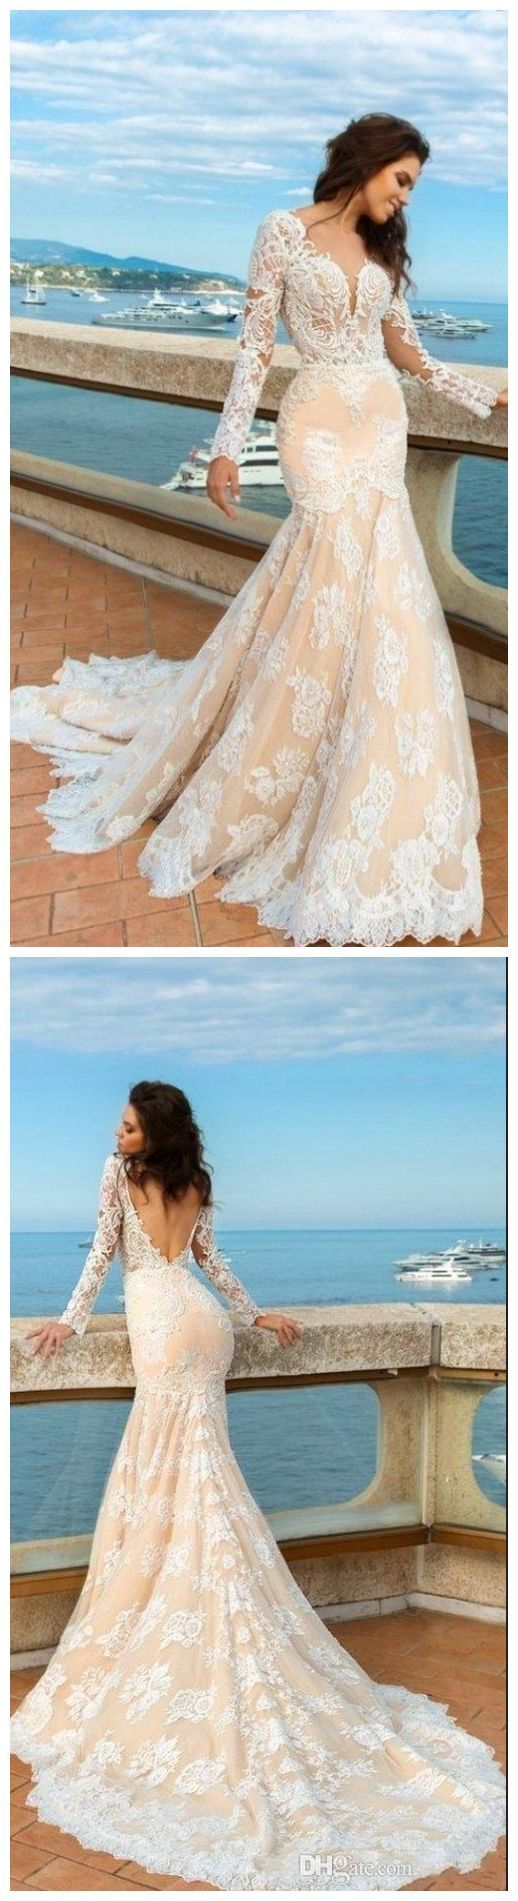 Mermaid Wedding Dress,custom Lace Wedding Dresses